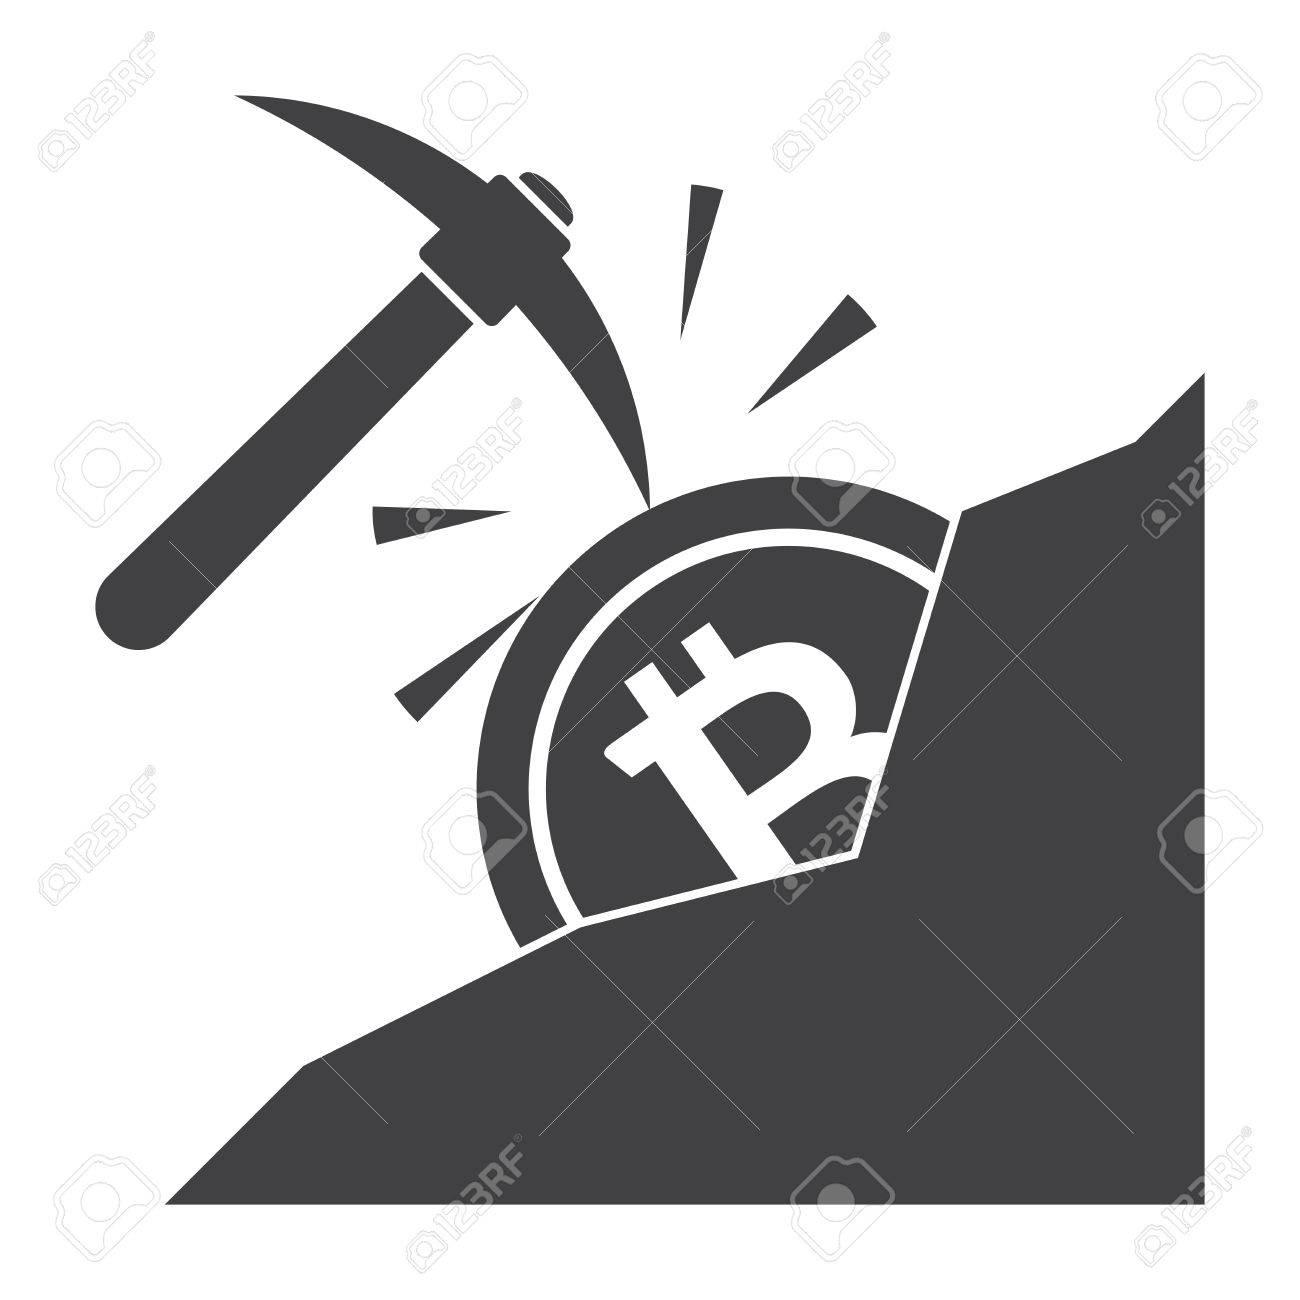 [Image: 82244565-bitcoin-mining-vector-illustration.jpg]